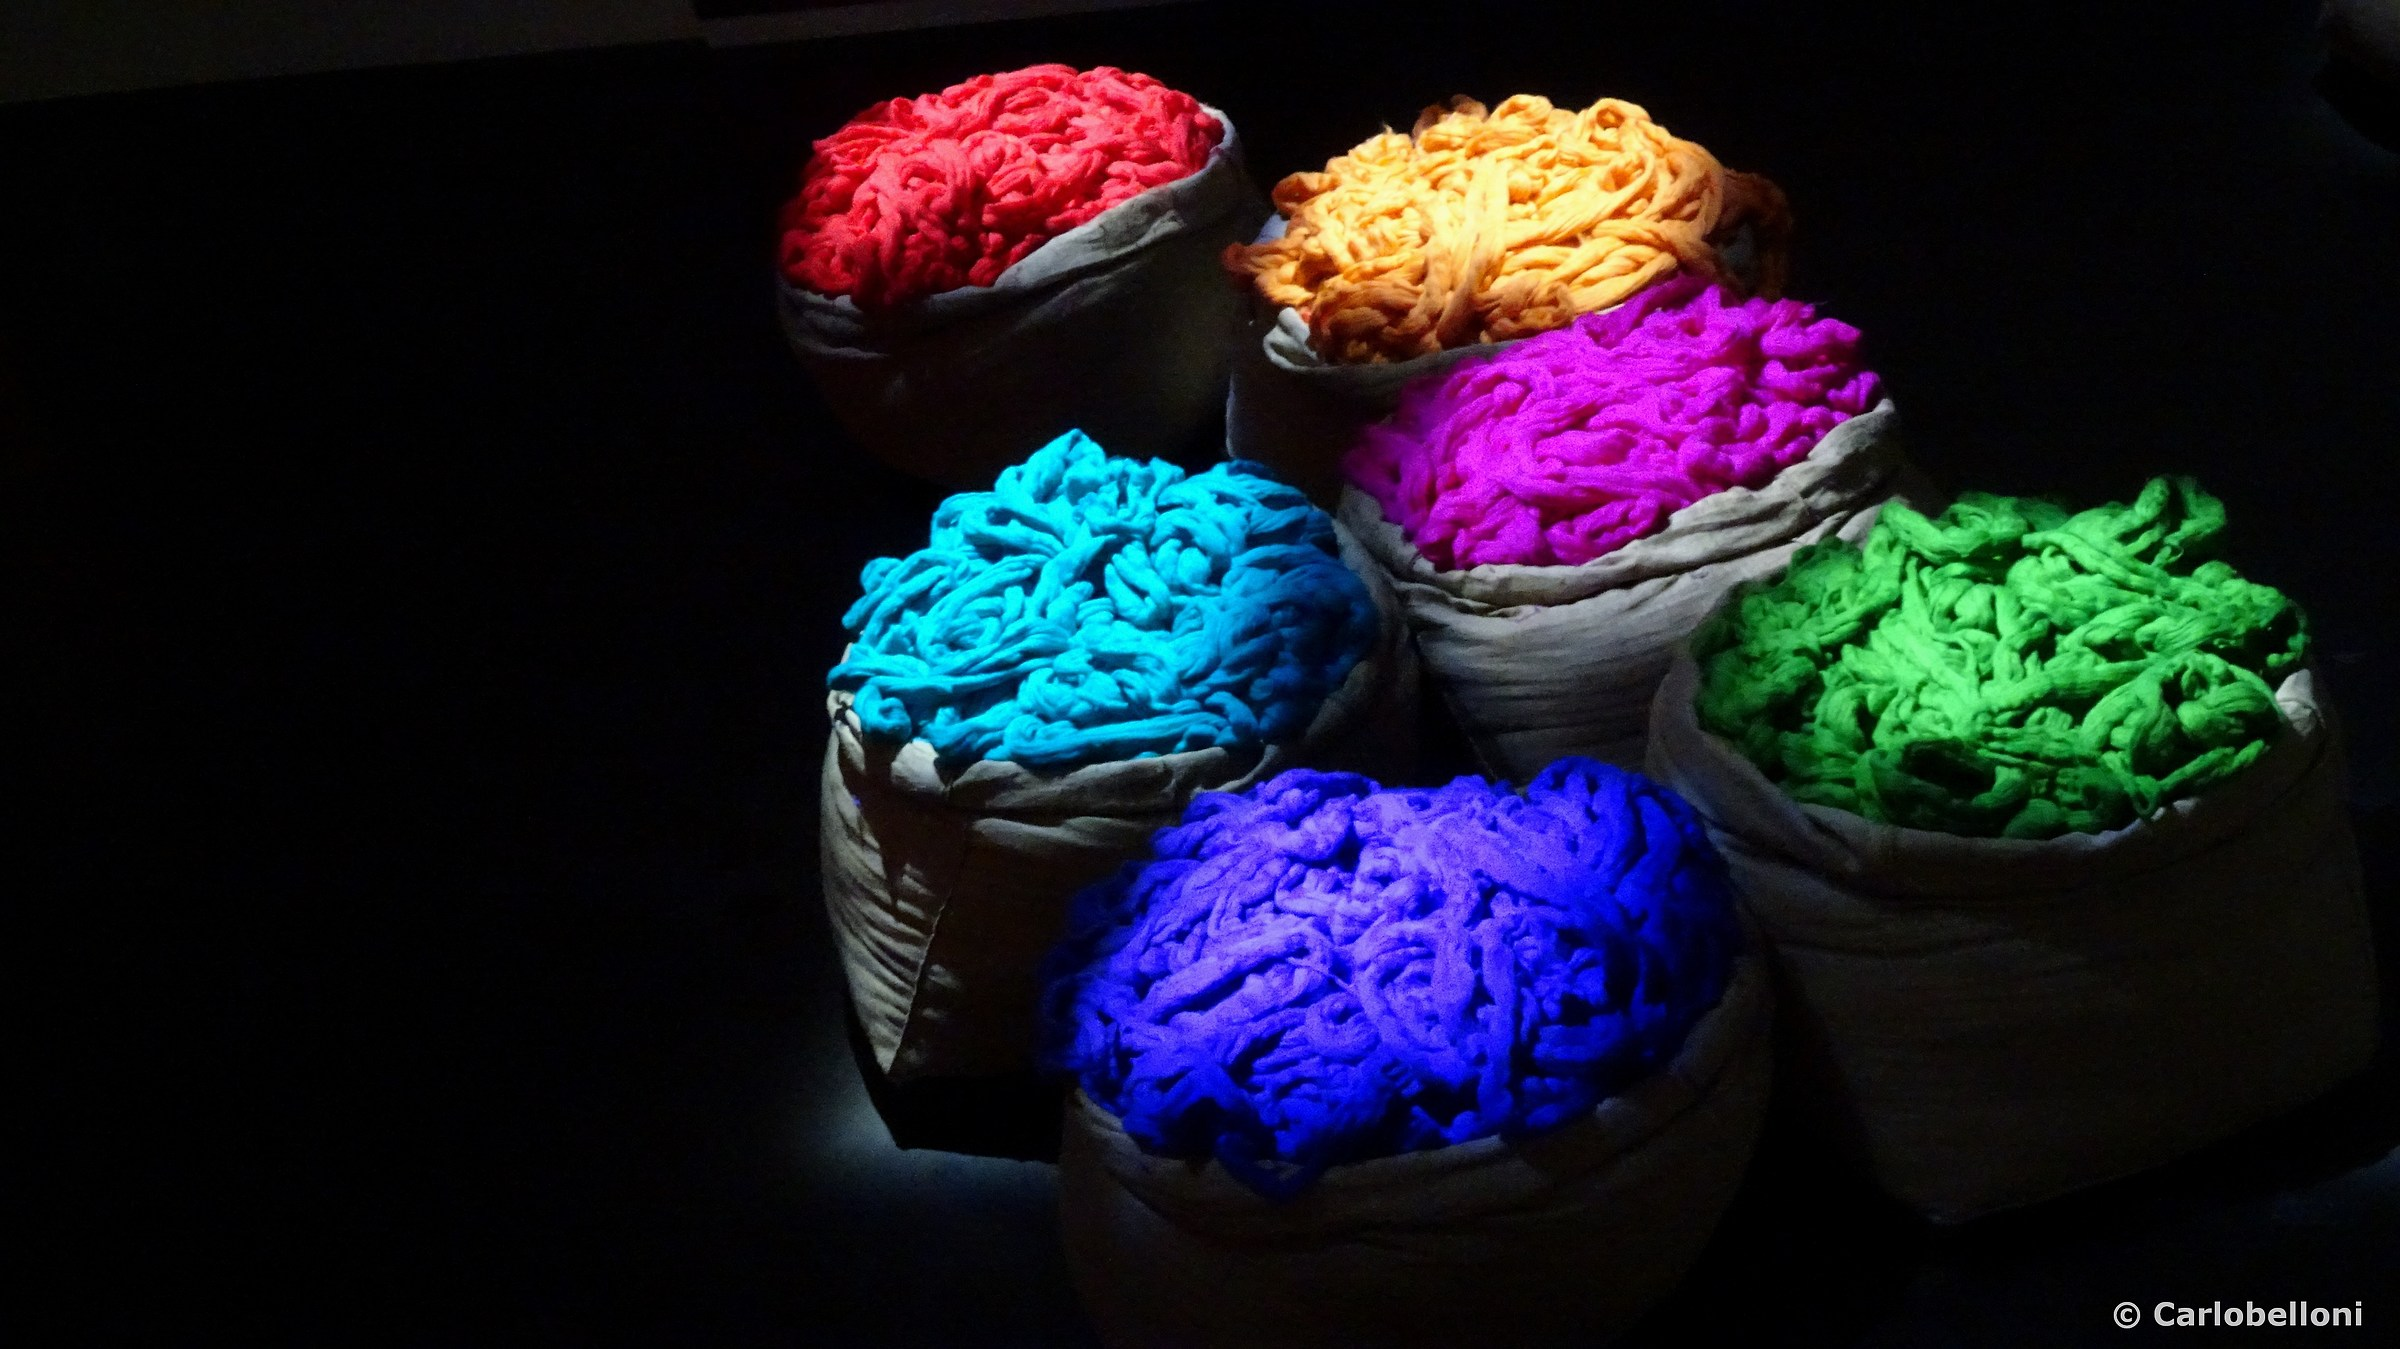 ... Color in the dark ......